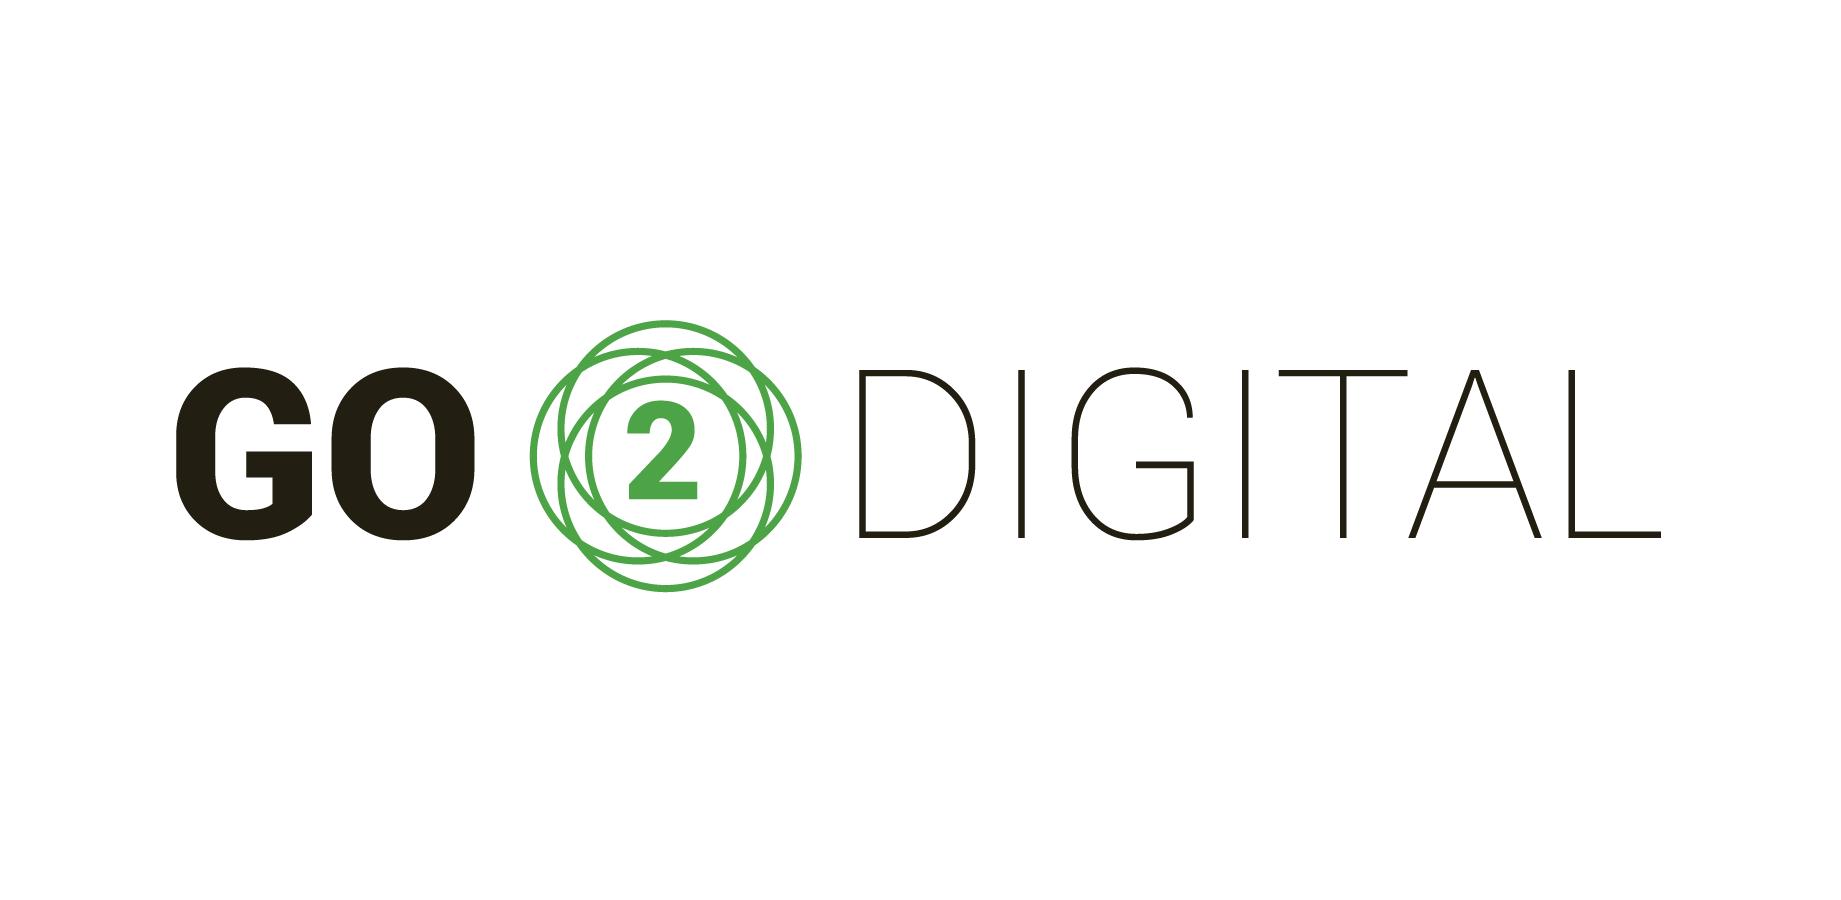 Go2digital